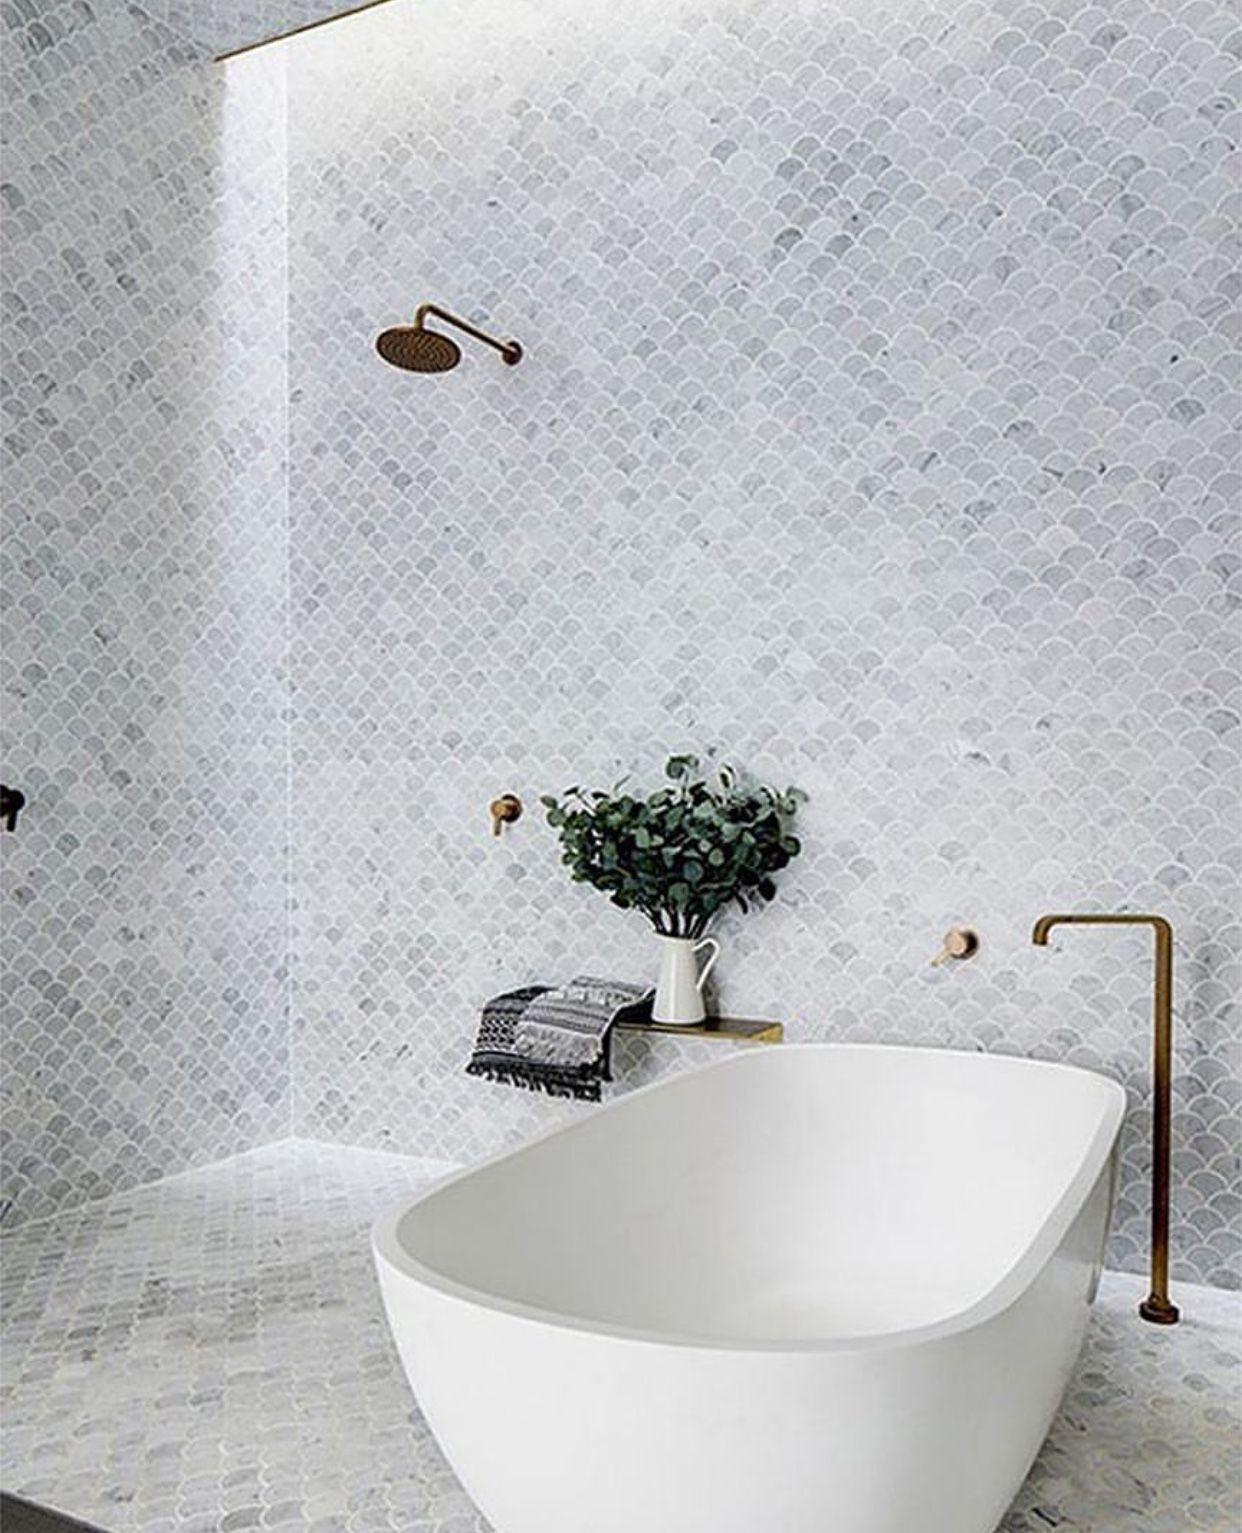 Dorf badezimmer design pin by carolina wilcke on badkamer  pinterest  bathroom tiles and